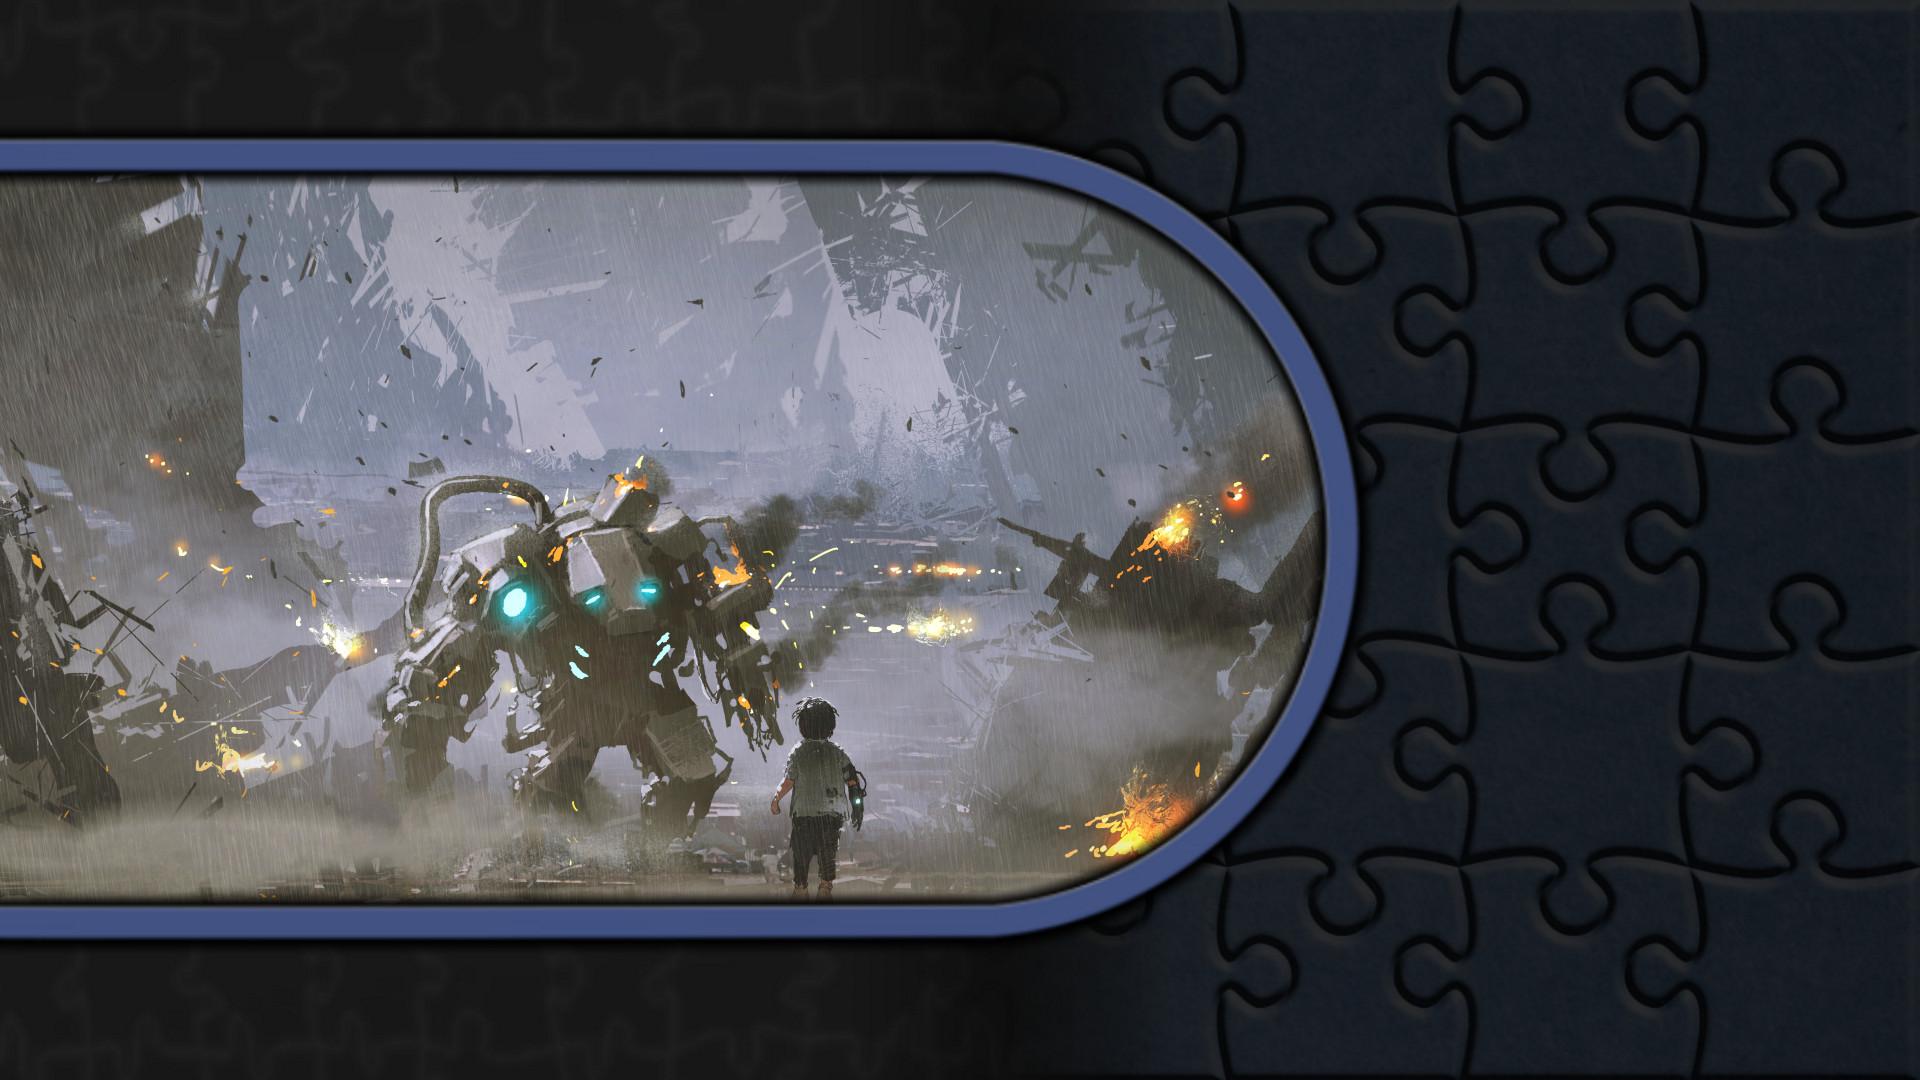 Pixel Puzzles Illustrations & Anime - Jigsaw Pack: Sci-Fi screenshot